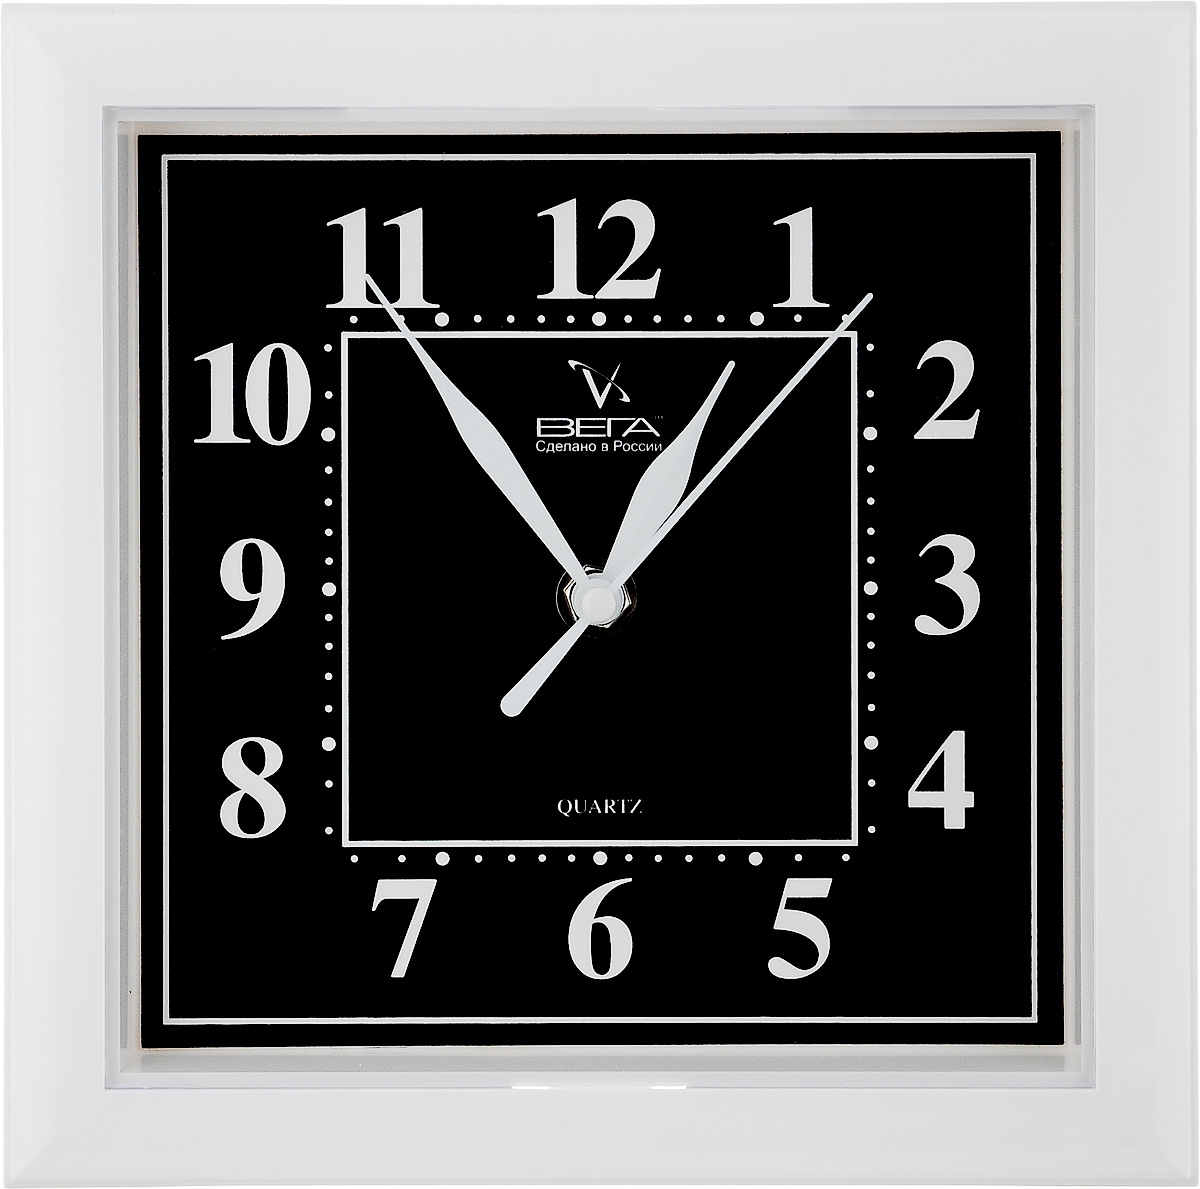 Часы настенные Вега Классика, цвет: белый, черный, 20,6 х 20,6 х 4 см часы настенные вега классика цвет белый